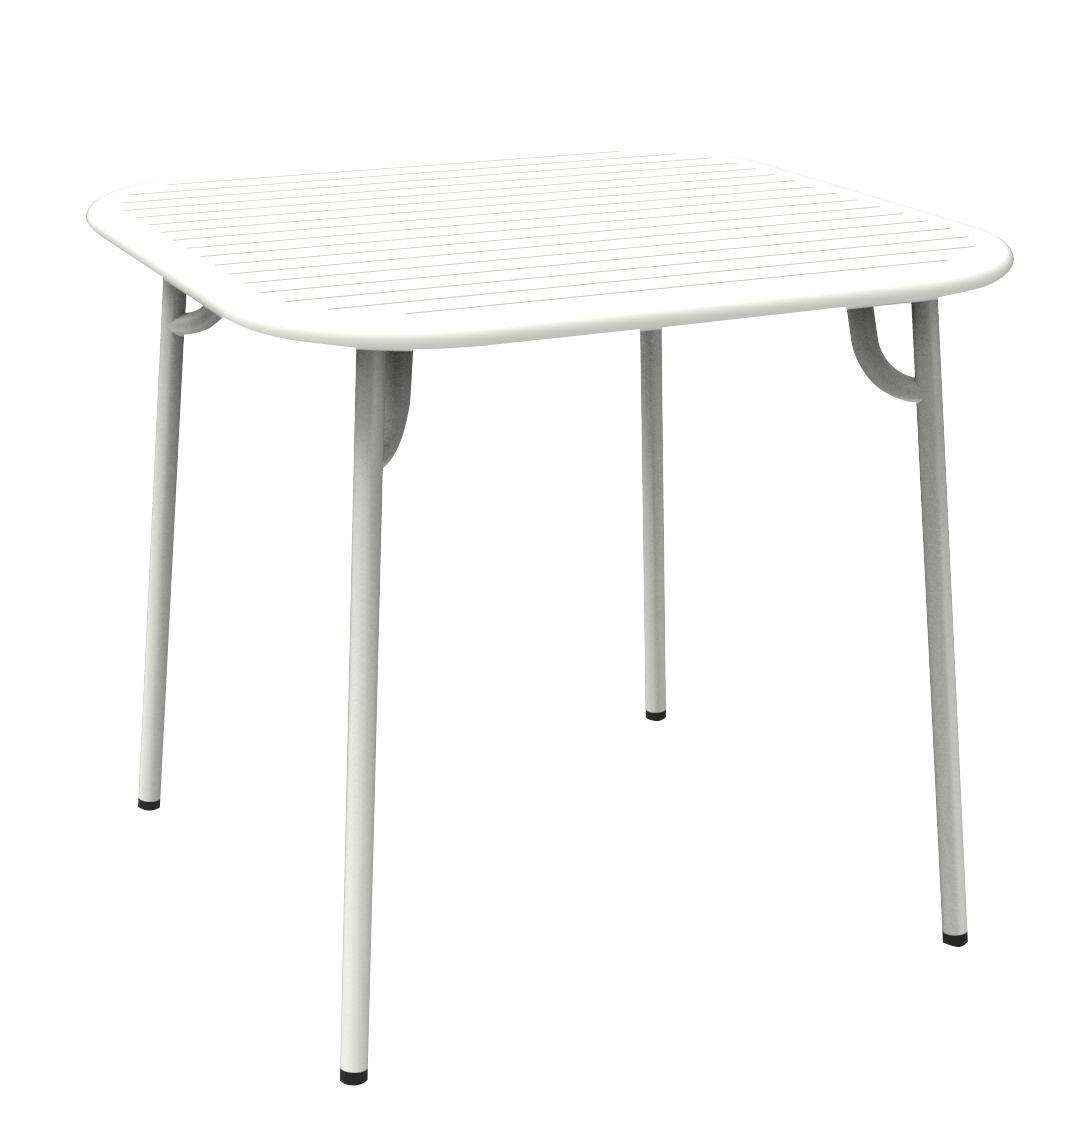 Jardin - Tables de jardin - Table Week-end / 85 x 85 cm - Aluminium - Petite Friture - Blanc - Aluminium thermolaqué époxy